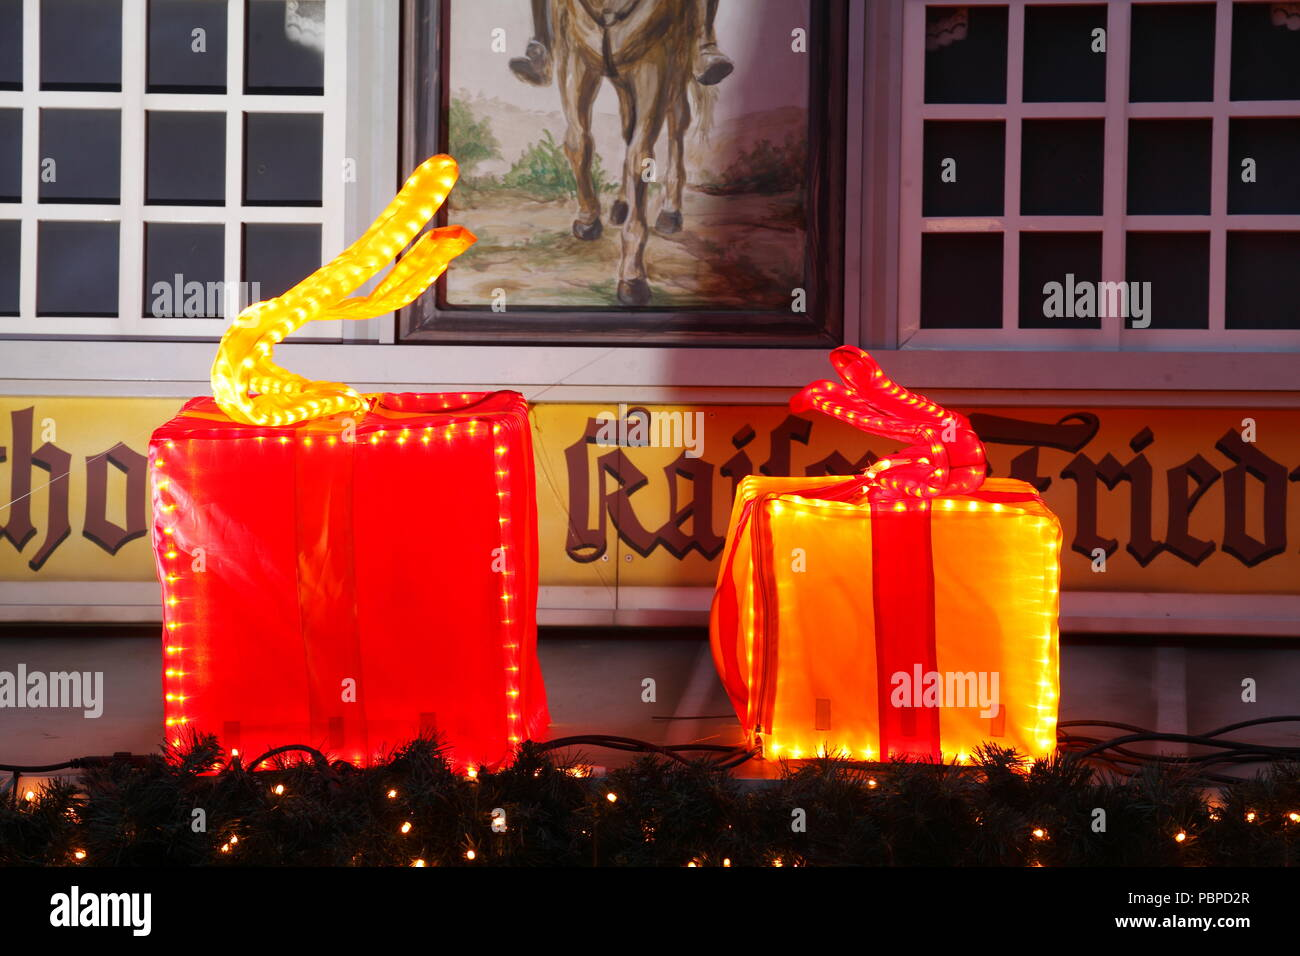 Illuminated Christmas packages, Christmas decoration at dusk, Bremen, Germany, Europe  I Beleuchtete Weihnachtspakete, Weihnachtsdekoration  bei Abend - Stock Image